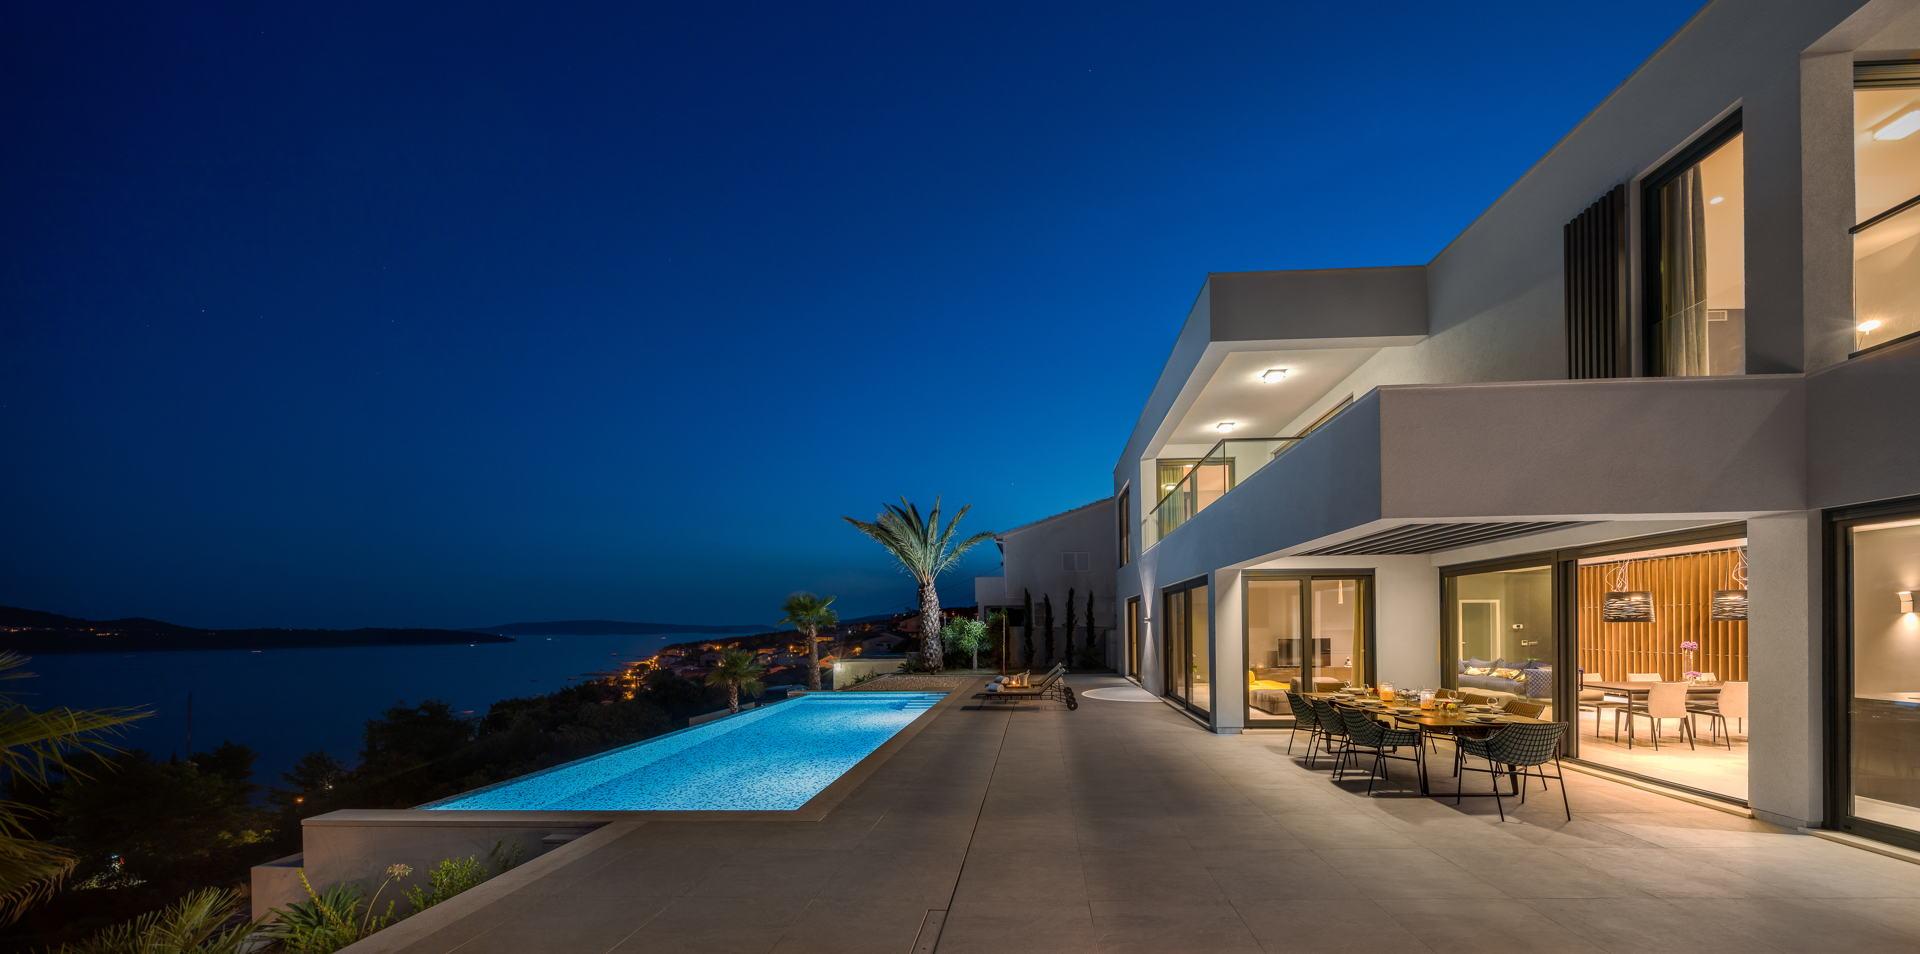 Ultraluxury Villa Elyzeum with Pool in Trogir area